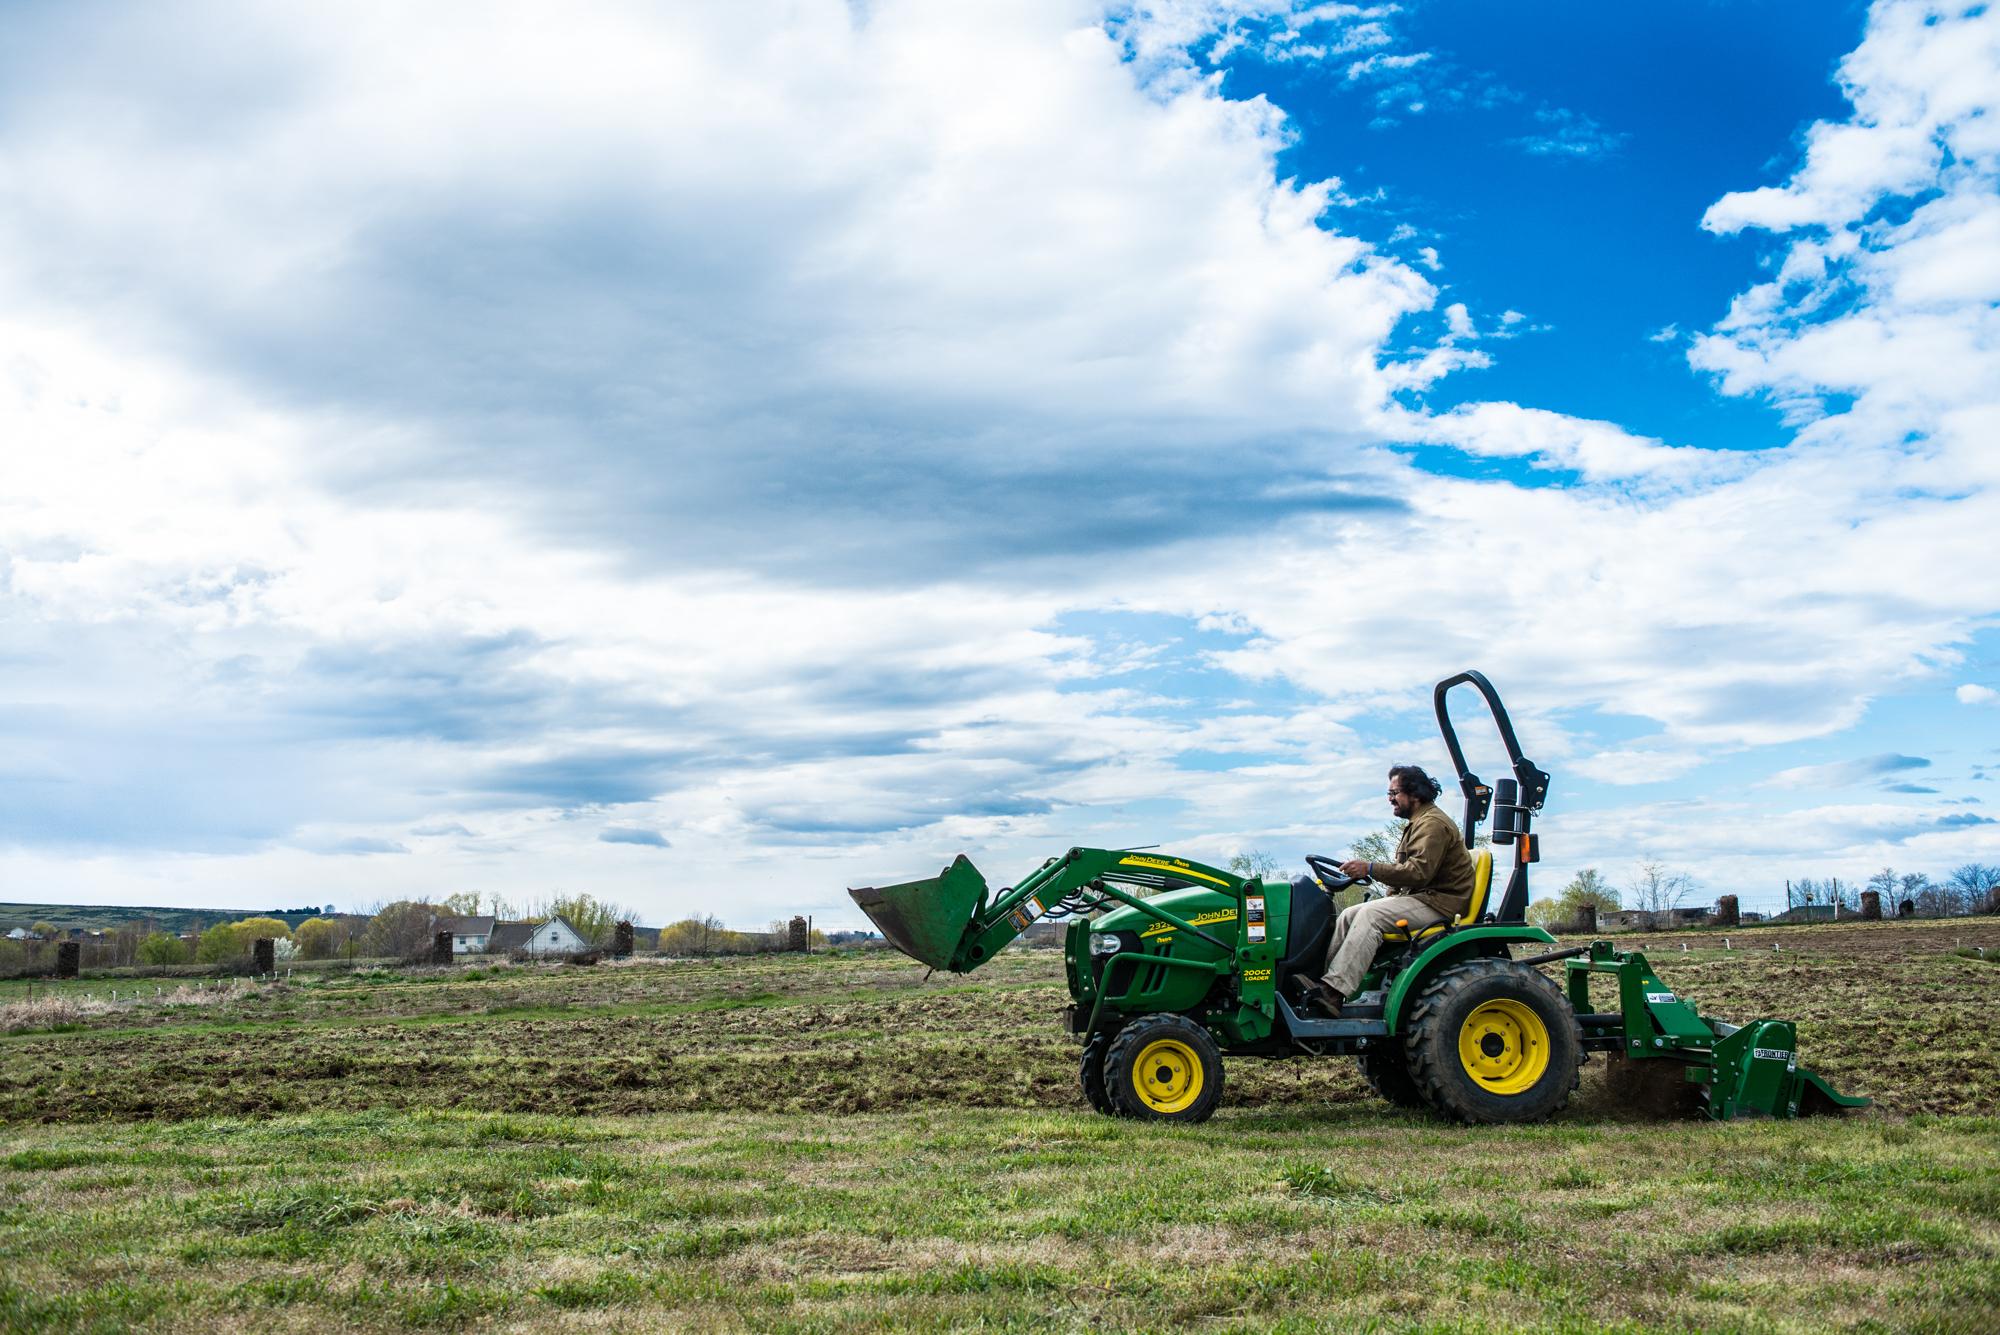 John Deer tractor on farm